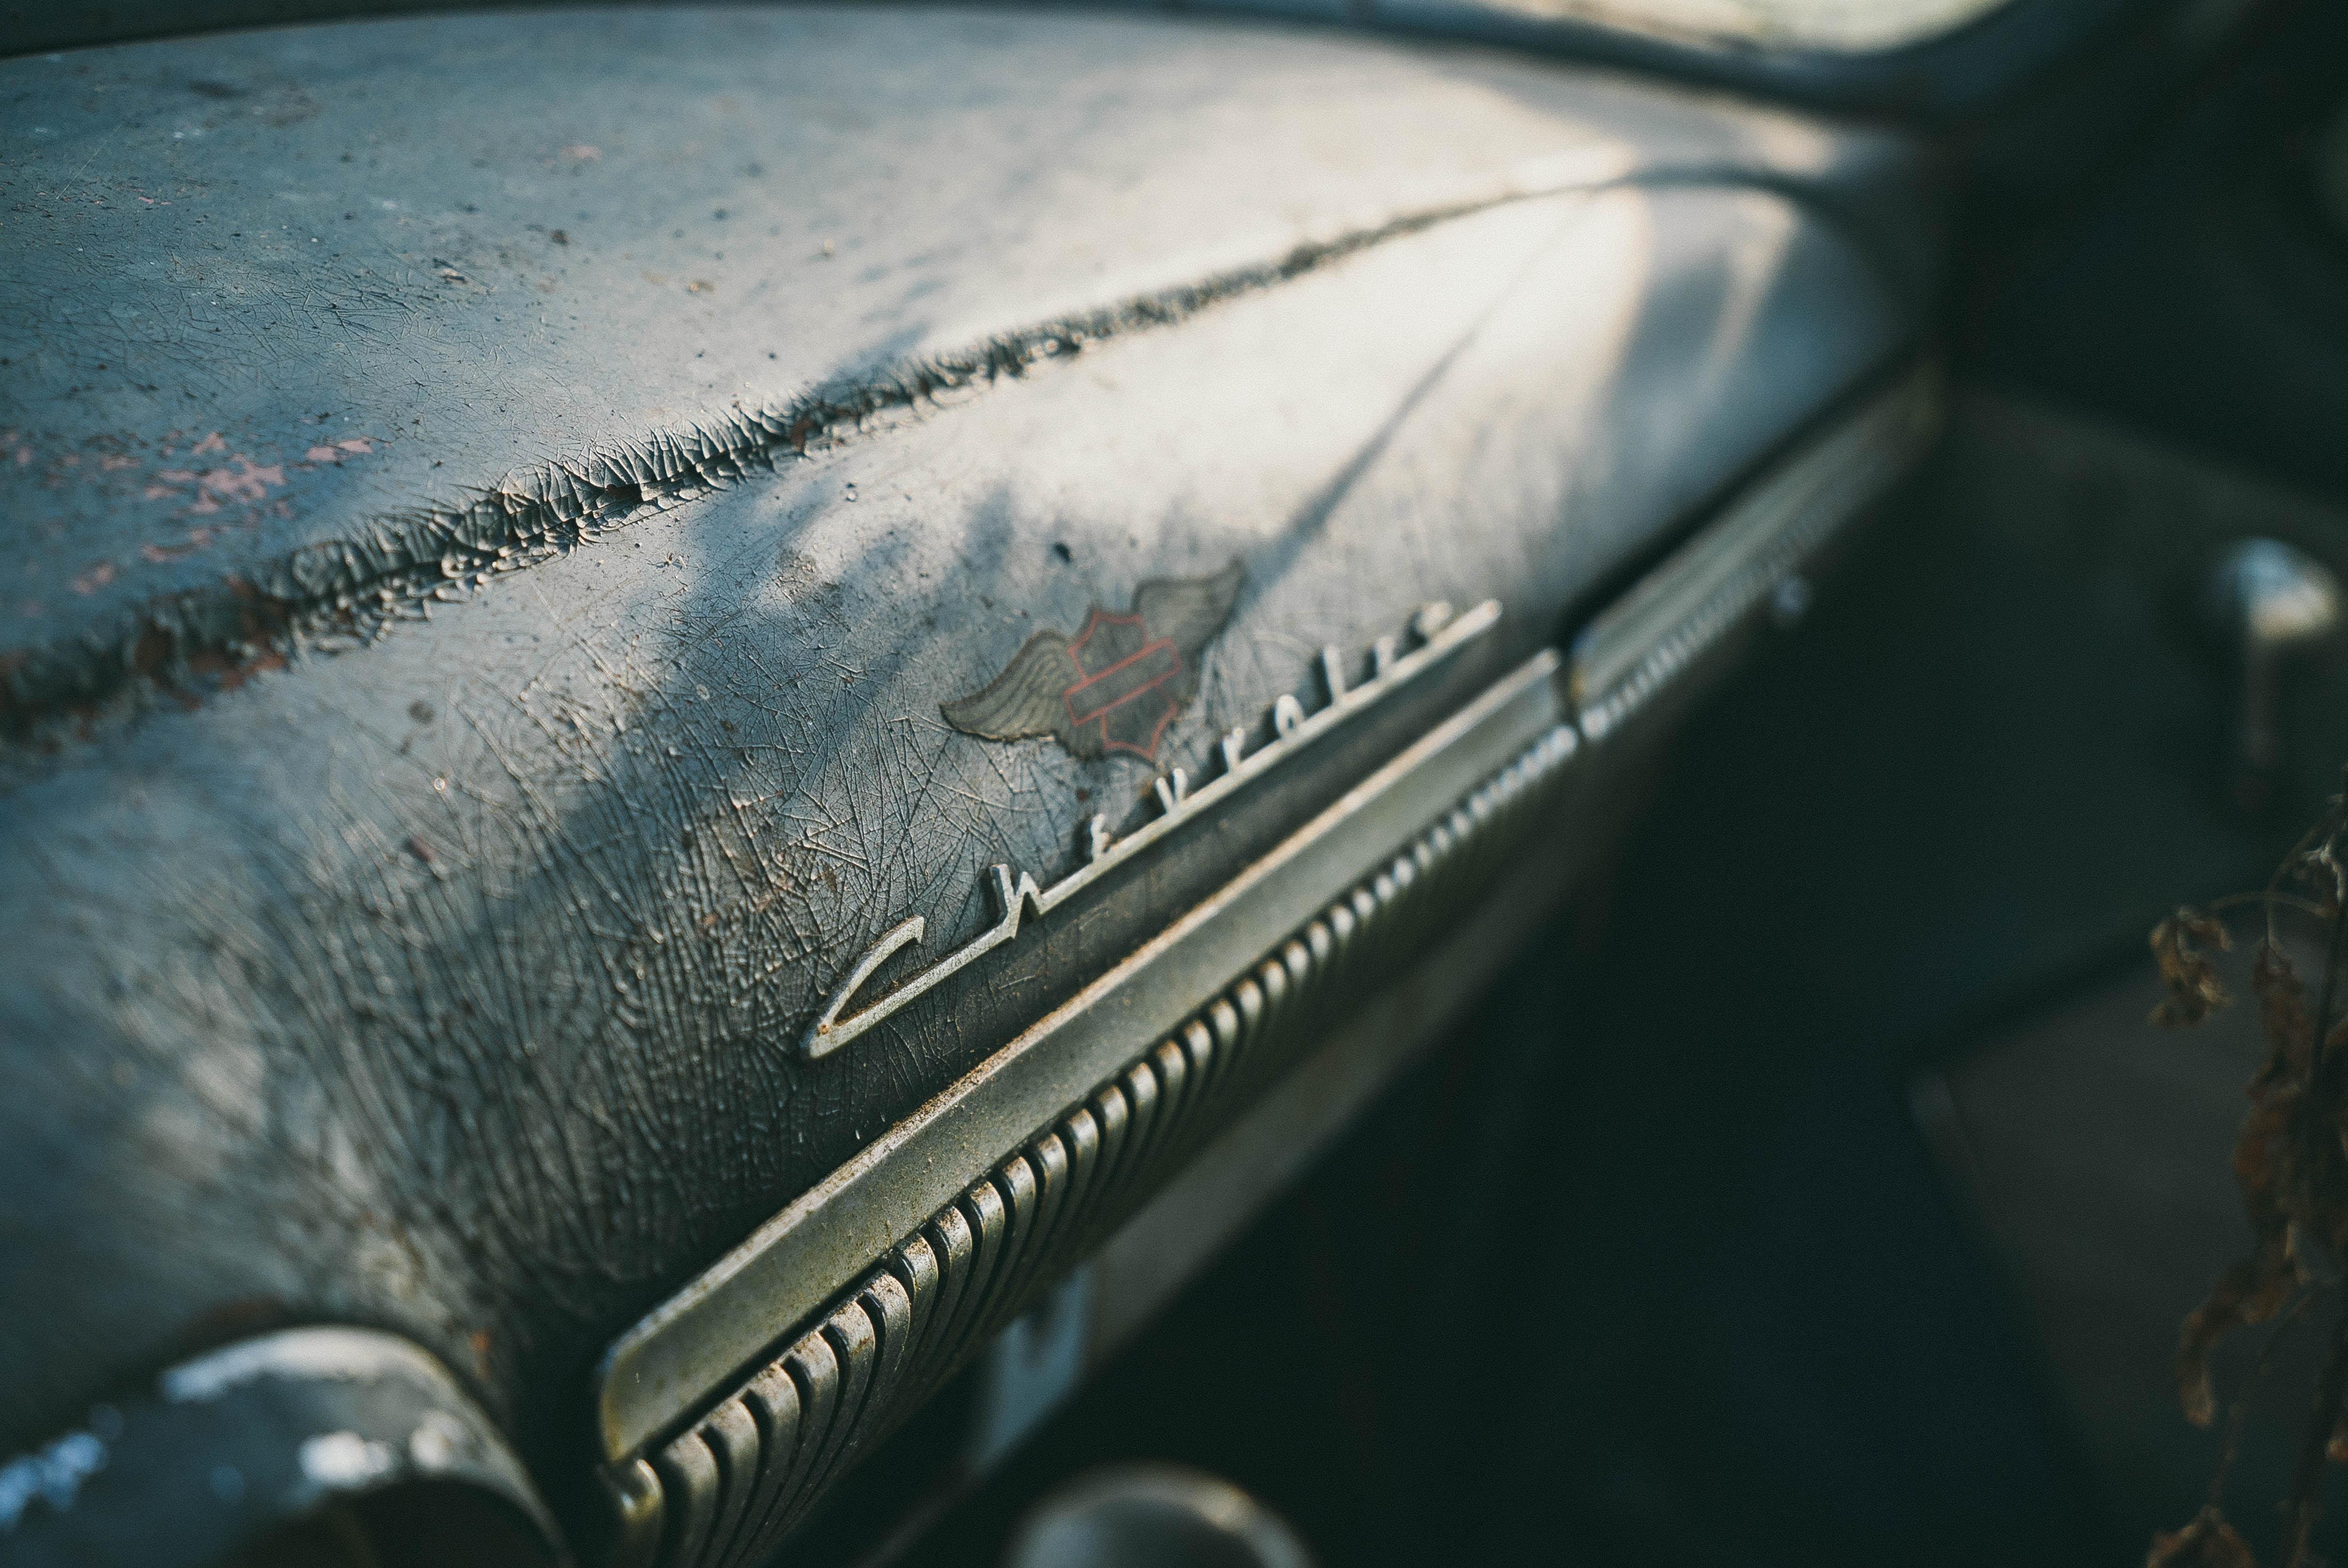 Close-up of vintage Chevrolet badge.